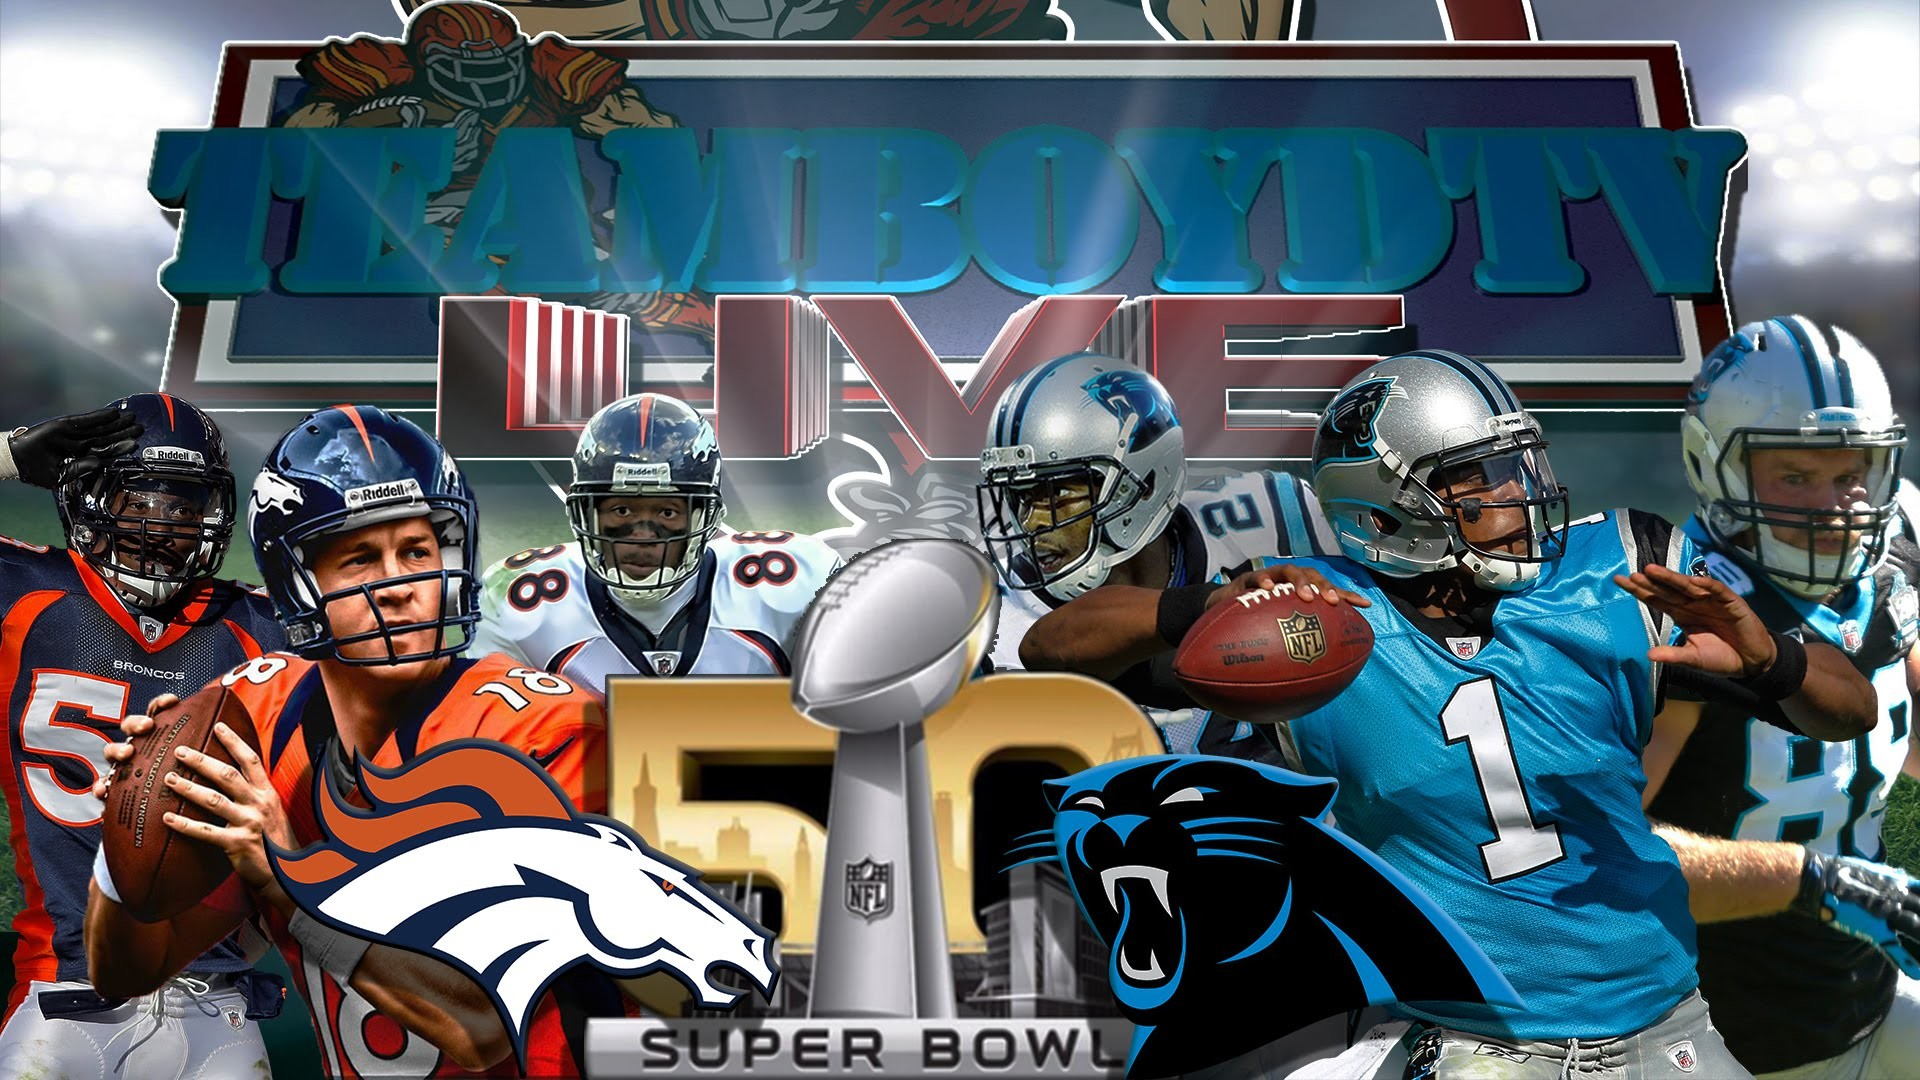 Season Finale, SB50, Johhny Manziel, Peyton Manning, L.A., Cam Newton